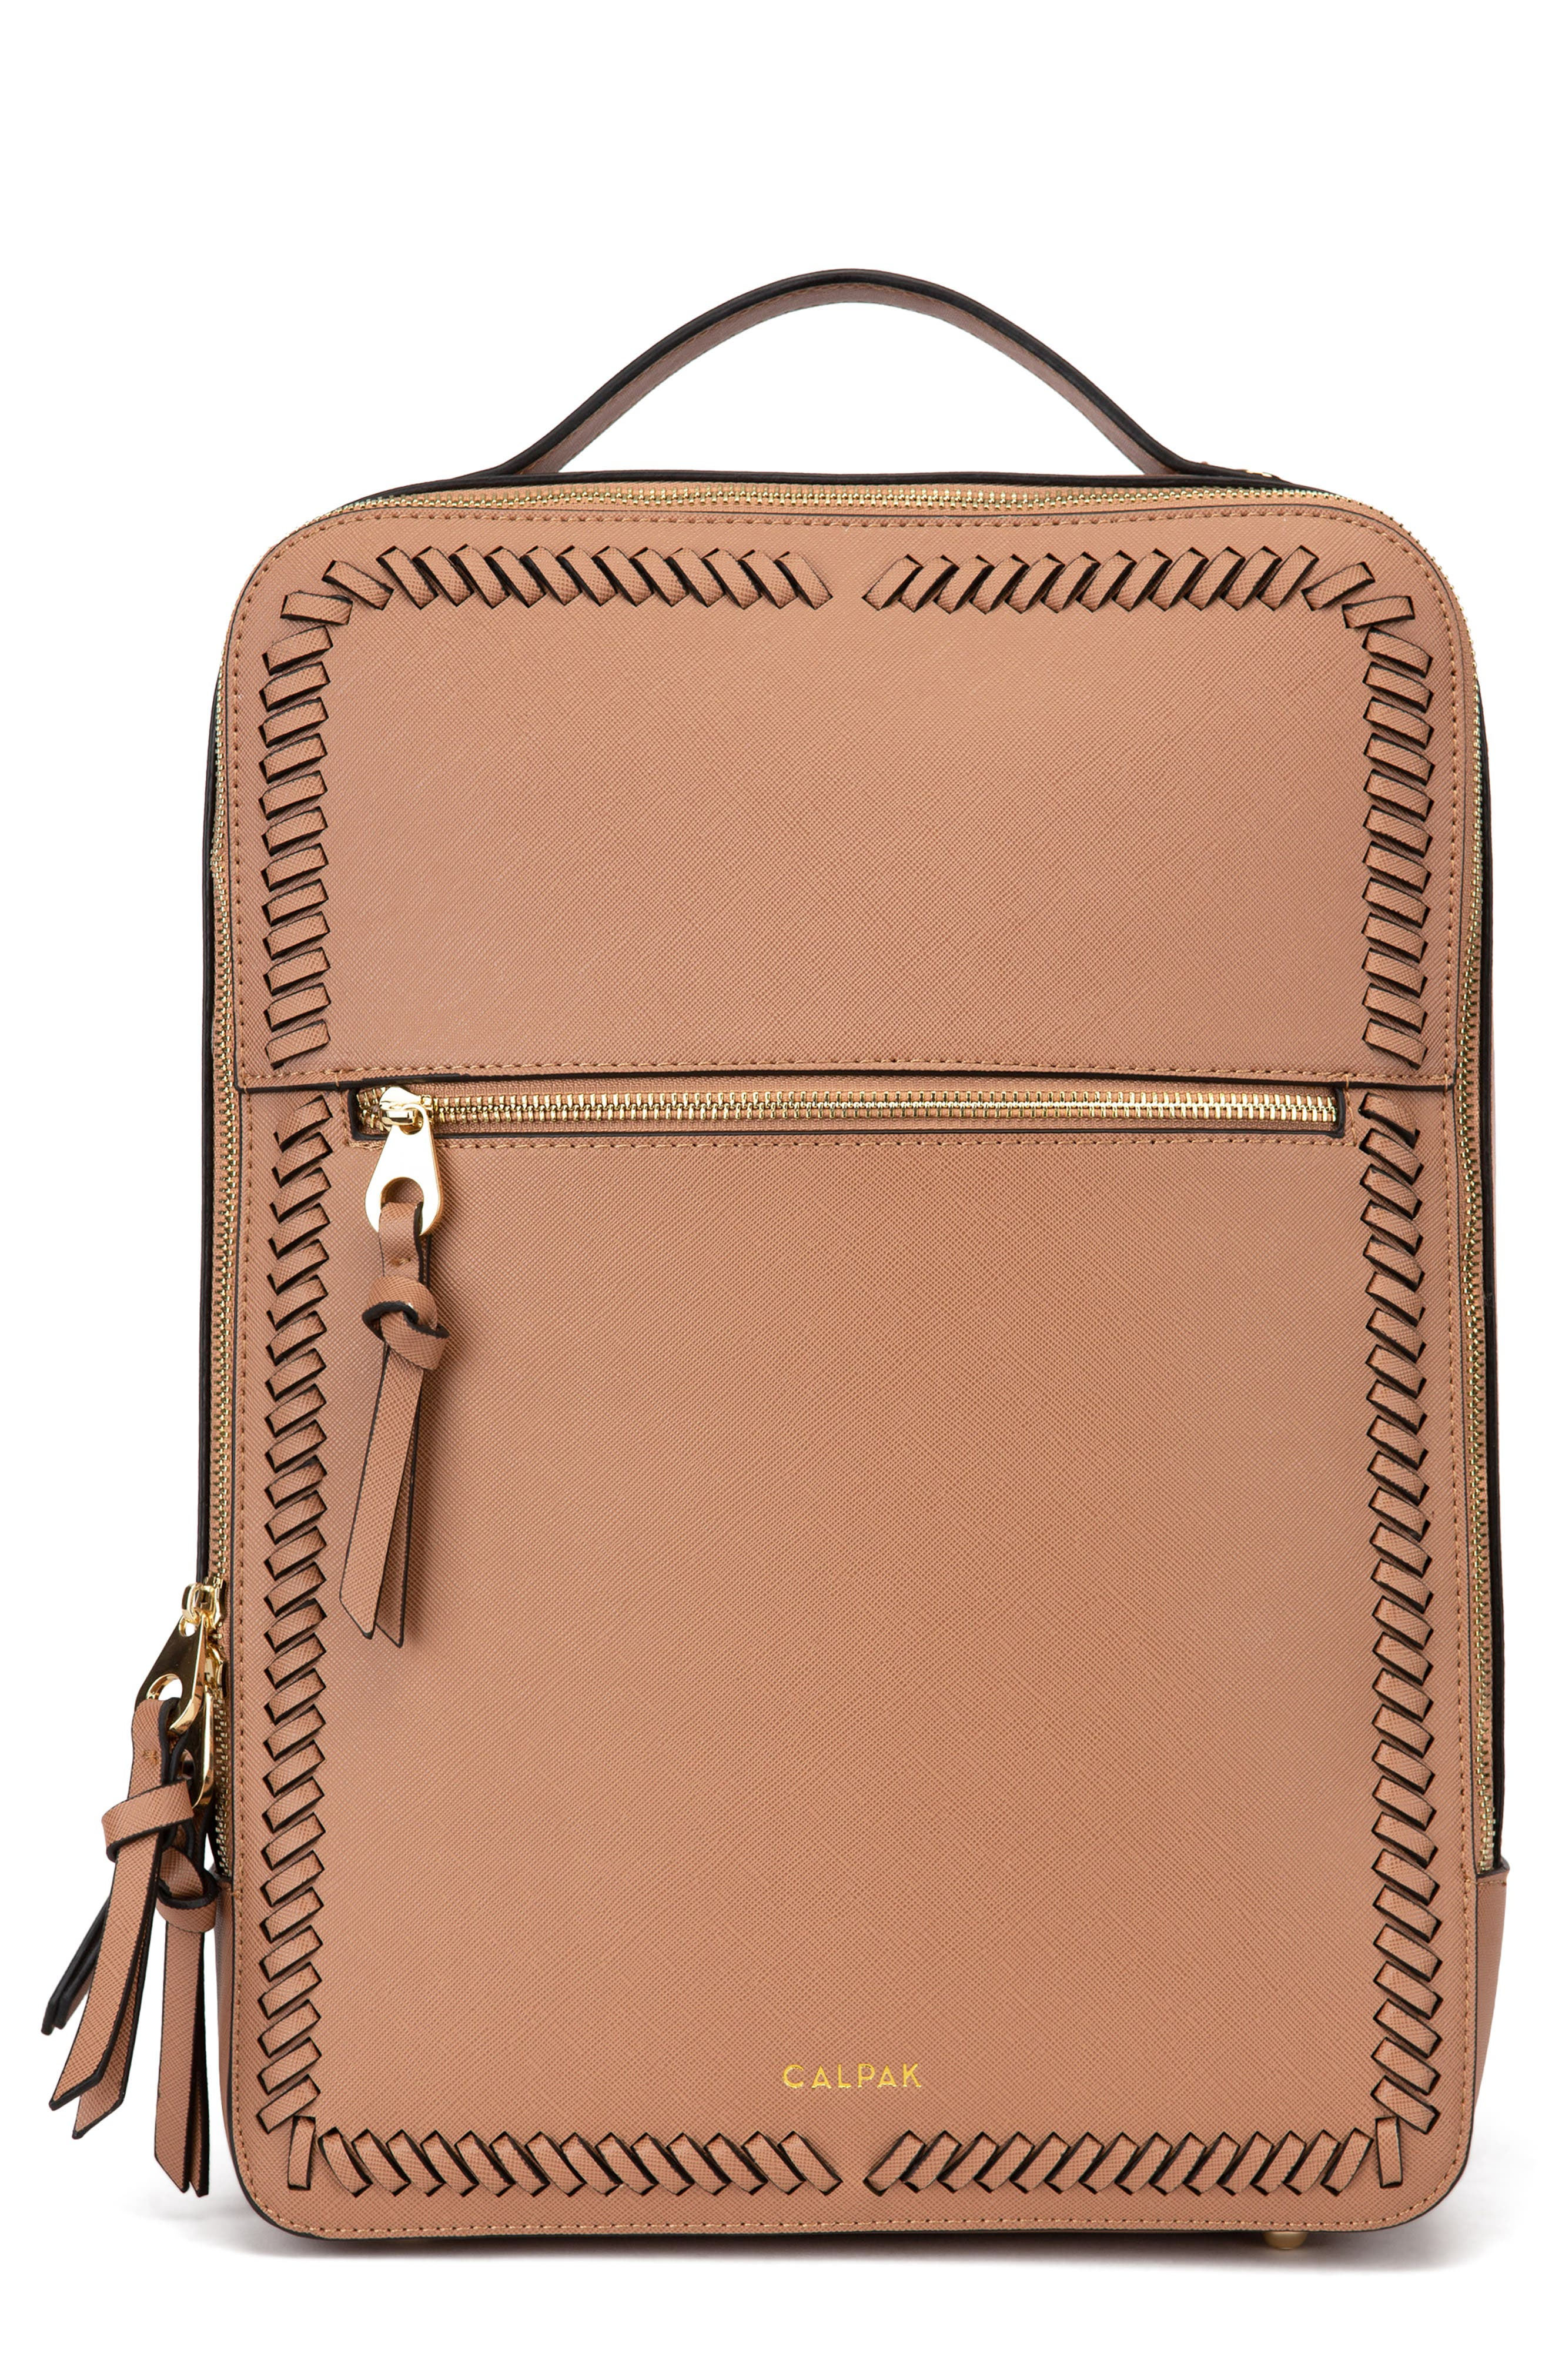 CALPAK Kaya Faux Leather Laptop Backpack, Main, color, CARAMEL